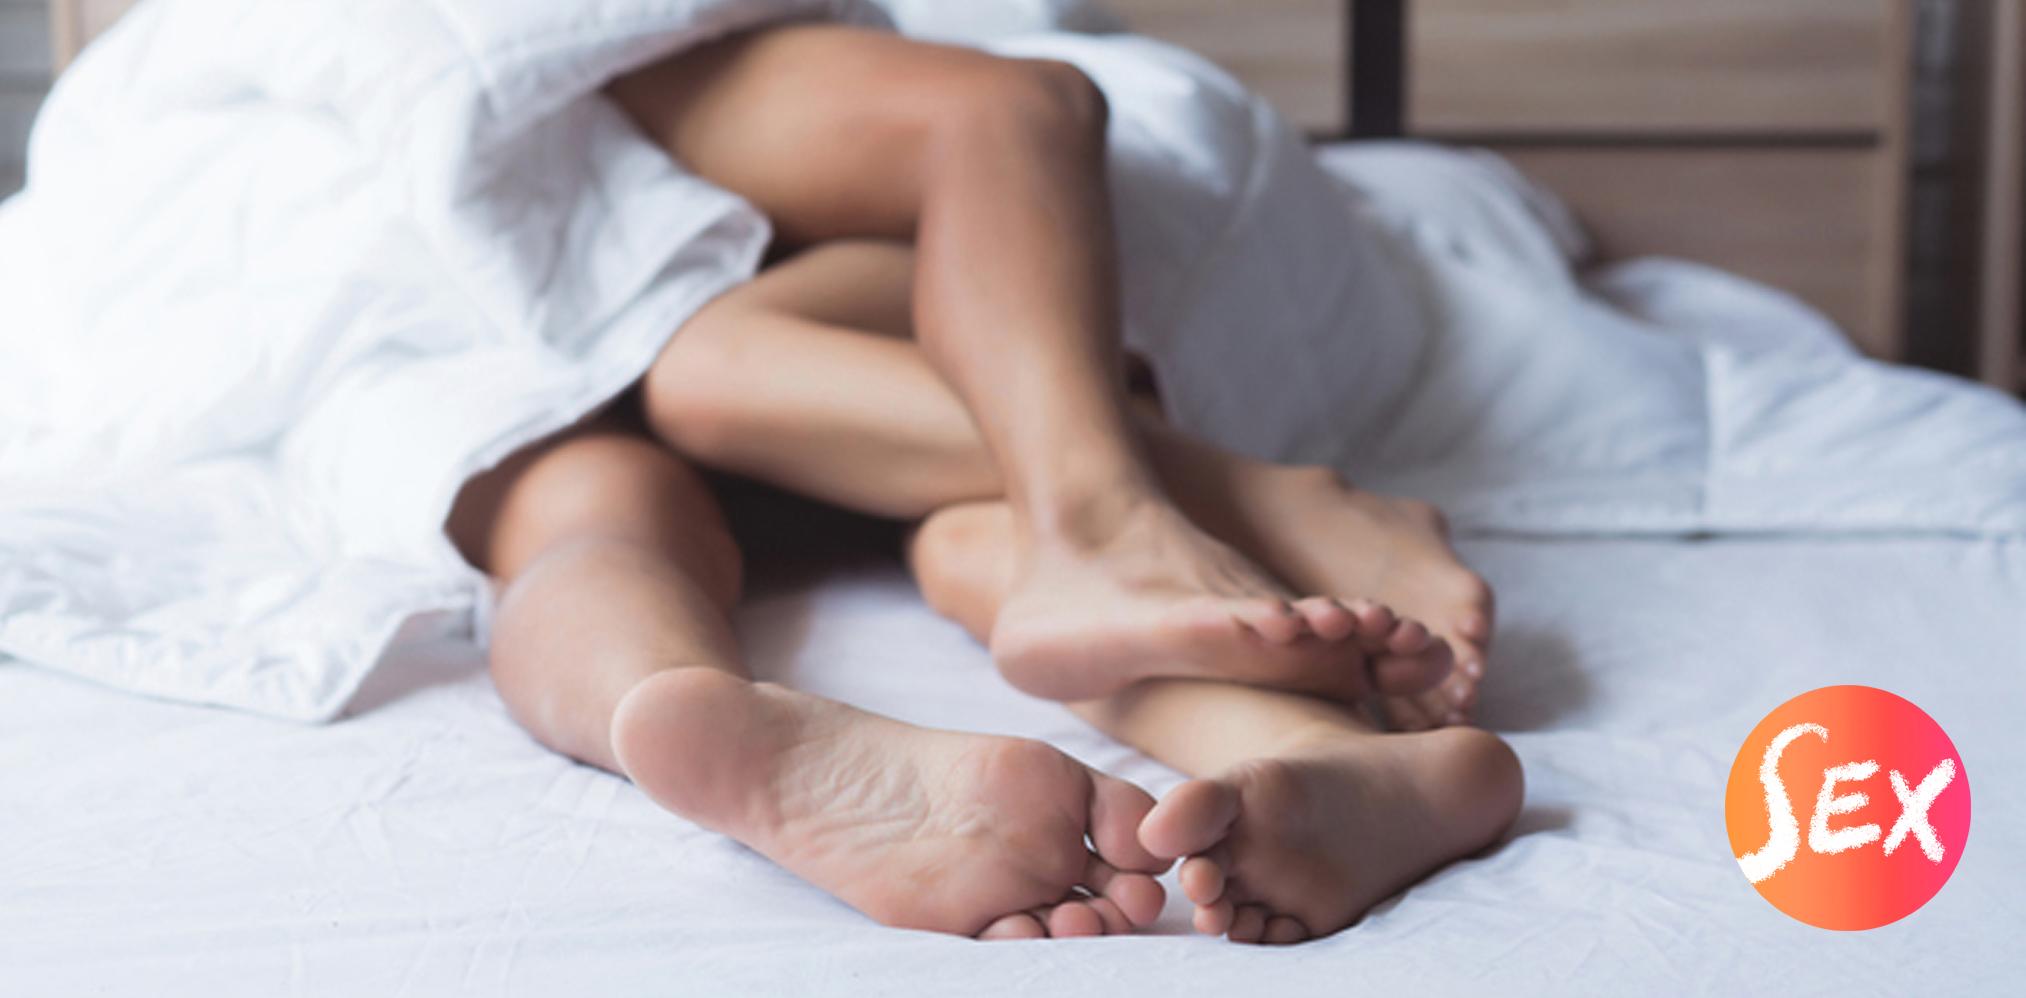 Freilos nackte Teenie-Porno-Bilder Amateurfrau interracial tube